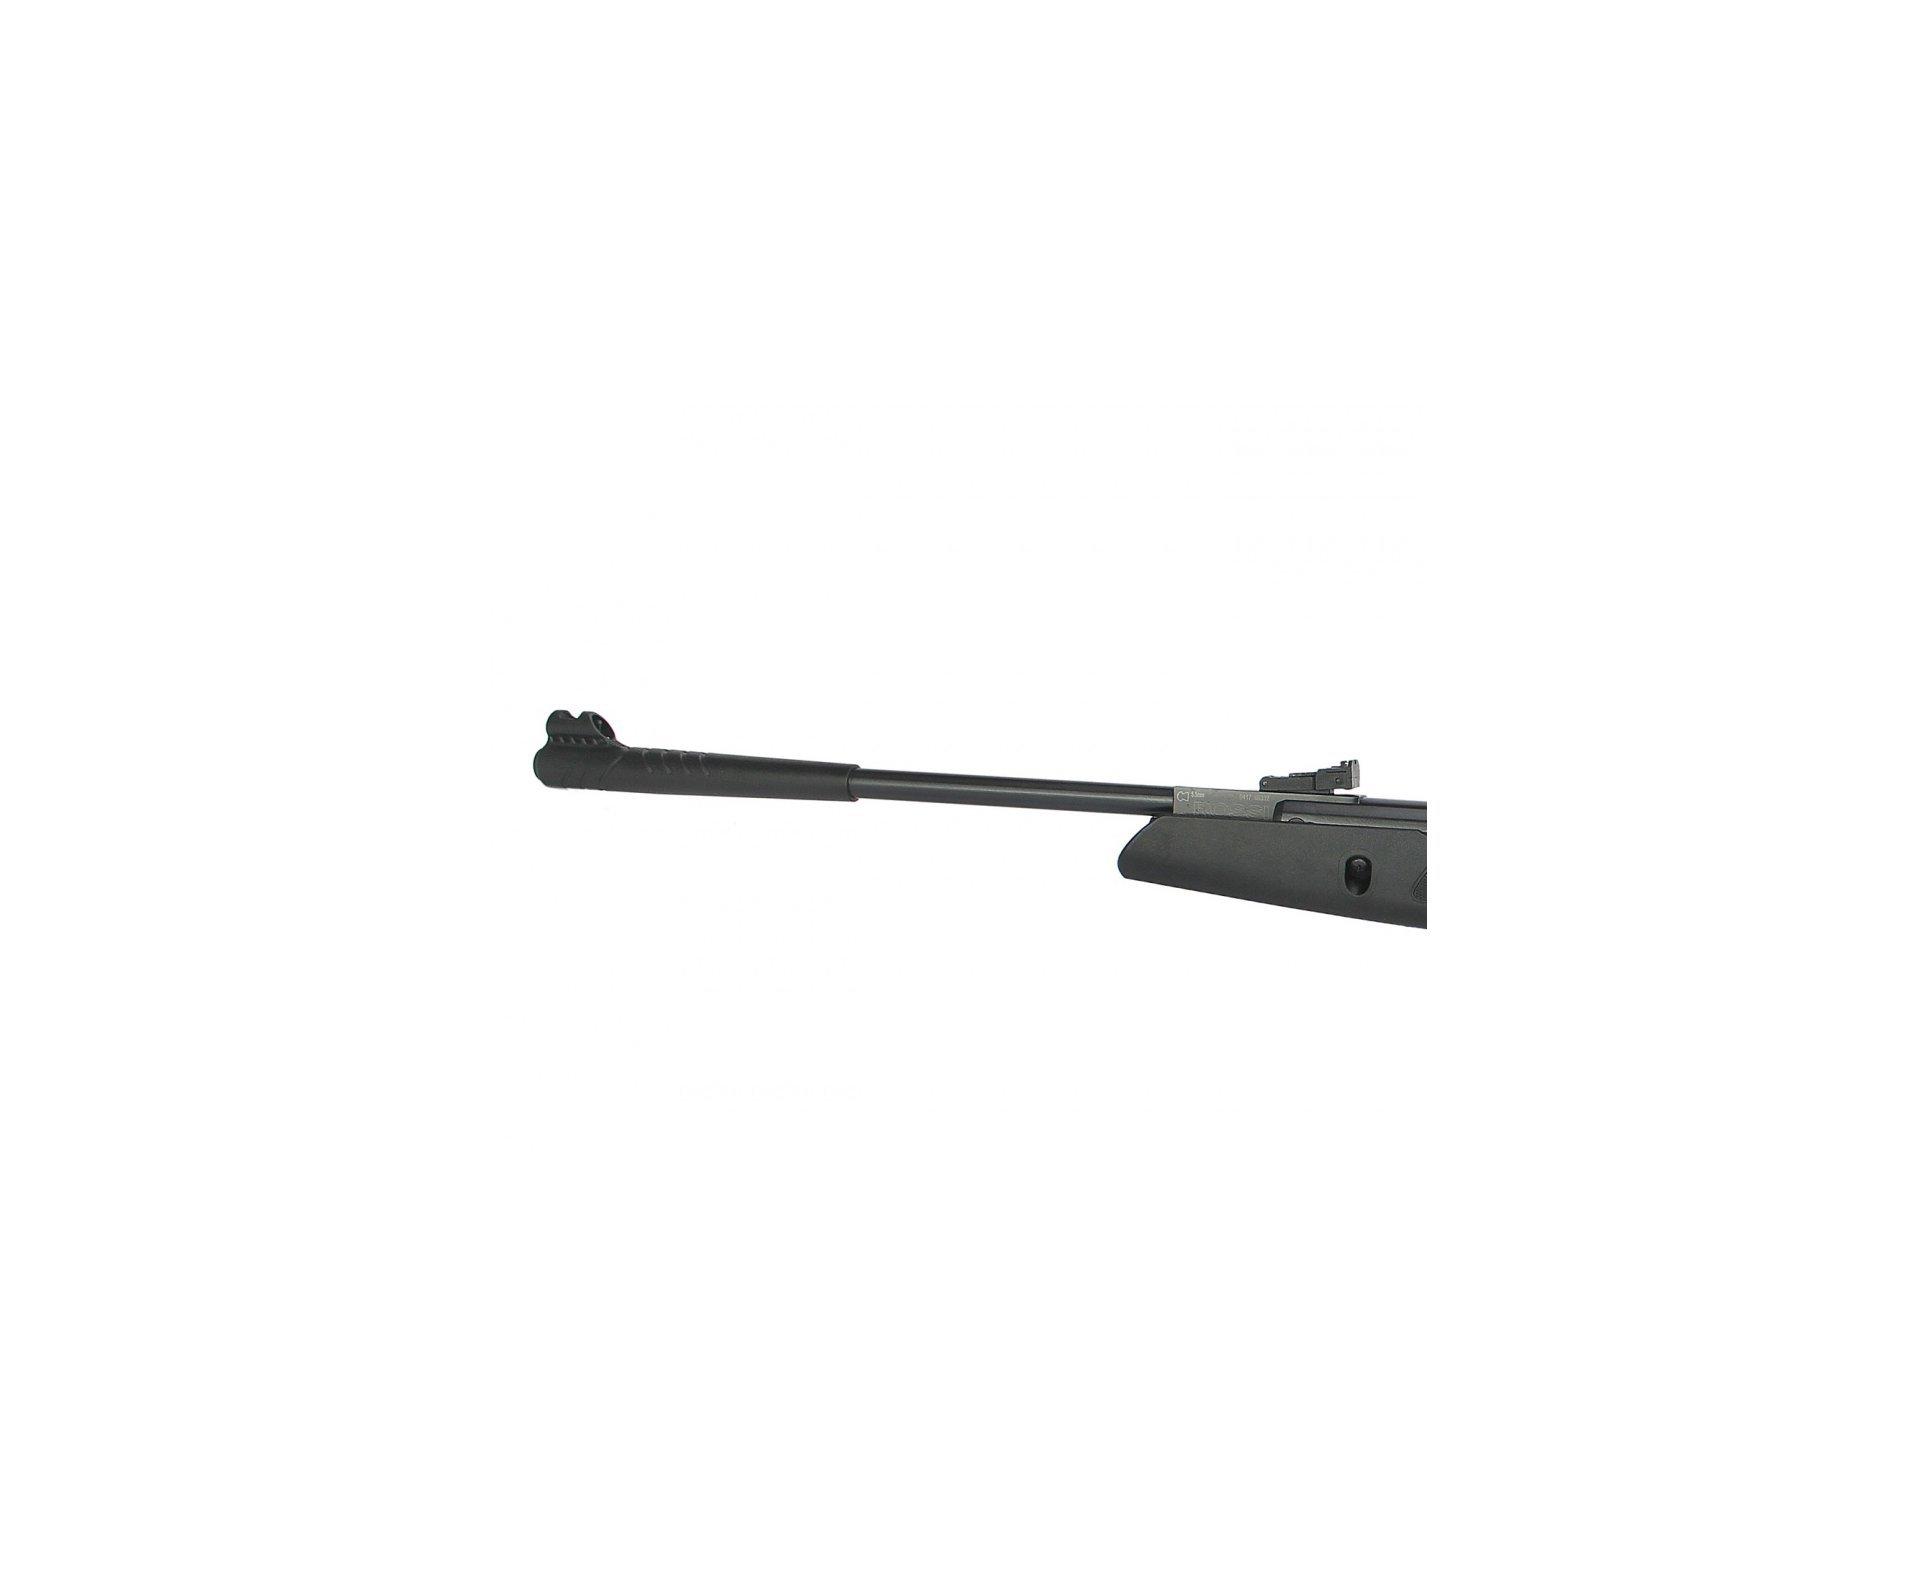 Carabina De Pressão Hatsan Striker Edge Com Gas Ram 60kg - Cal 5,5 Mm